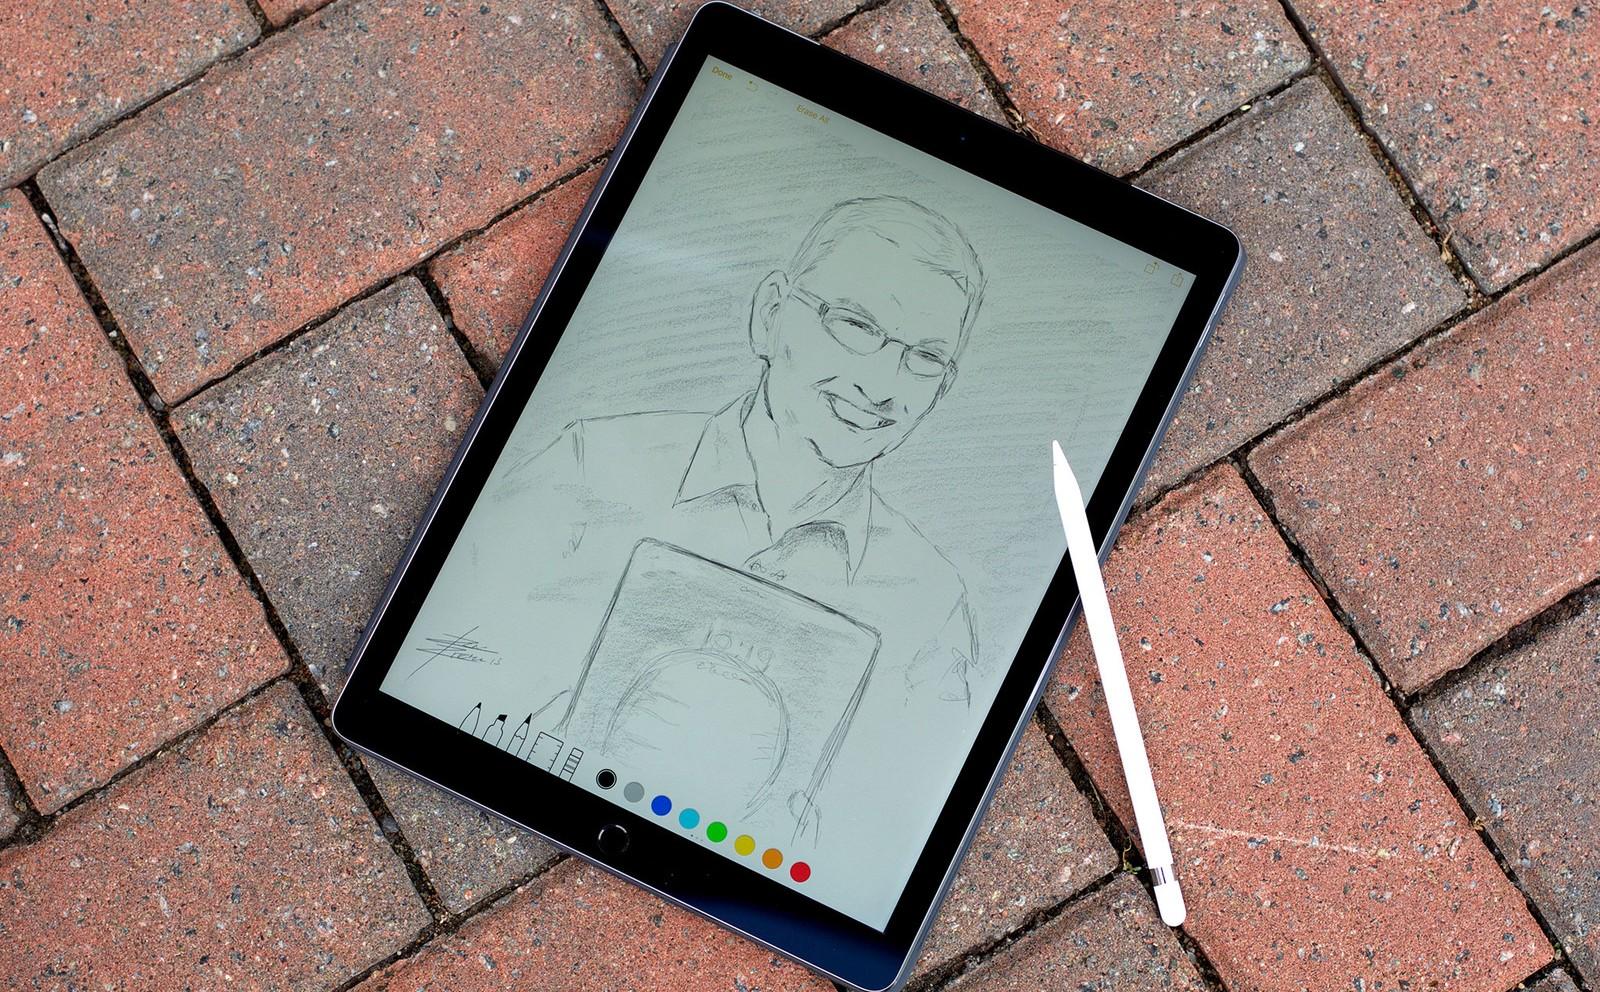 Graphic designers choose Apple iPad Pro and Pencil